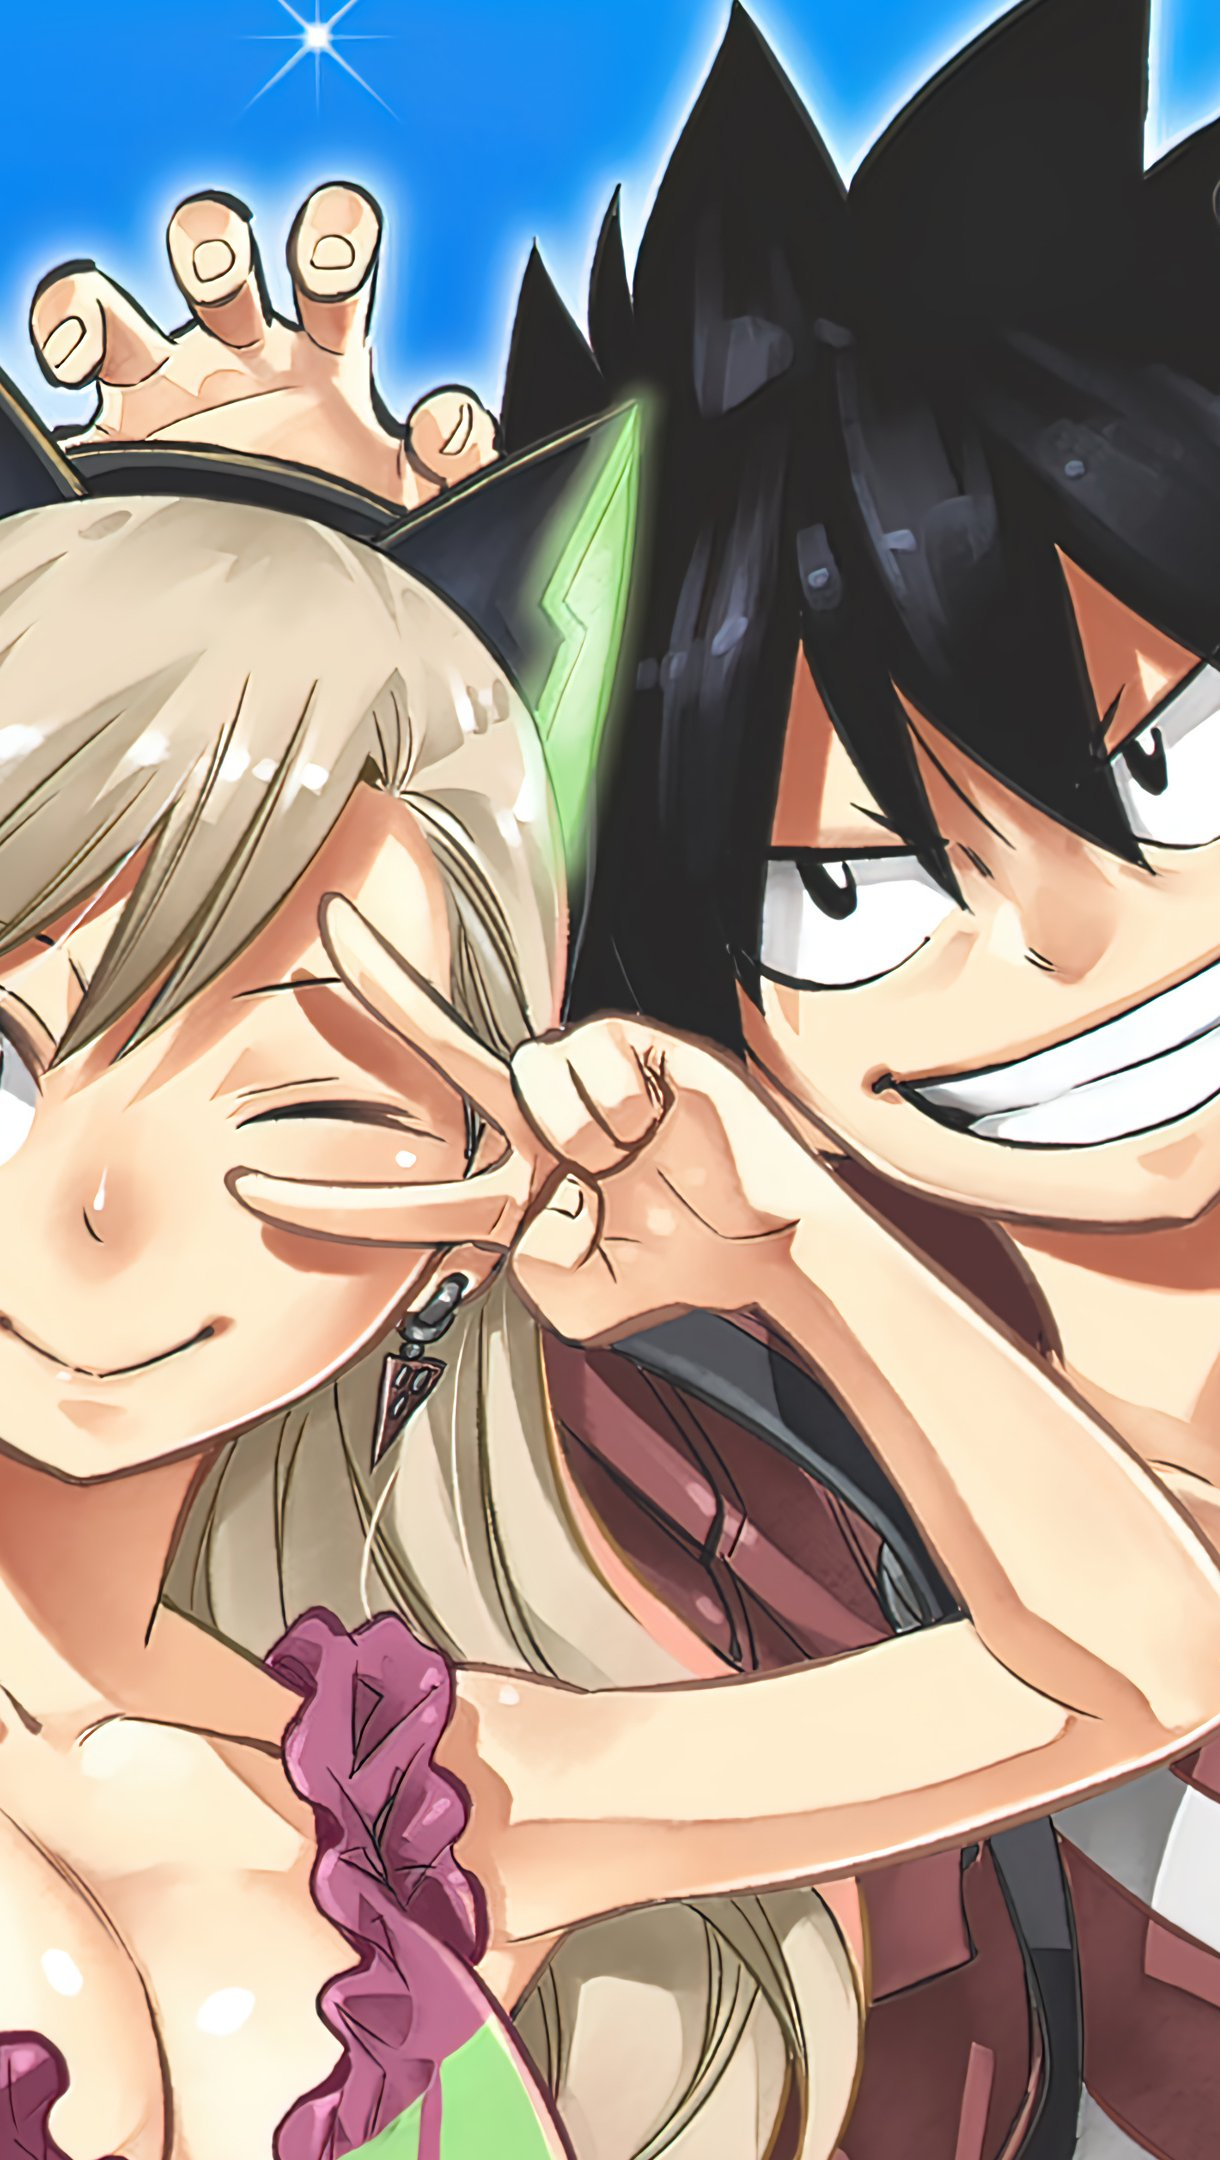 Fondos de pantalla Anime Personajes Shiki y Rebecca de Edens Zero Vertical